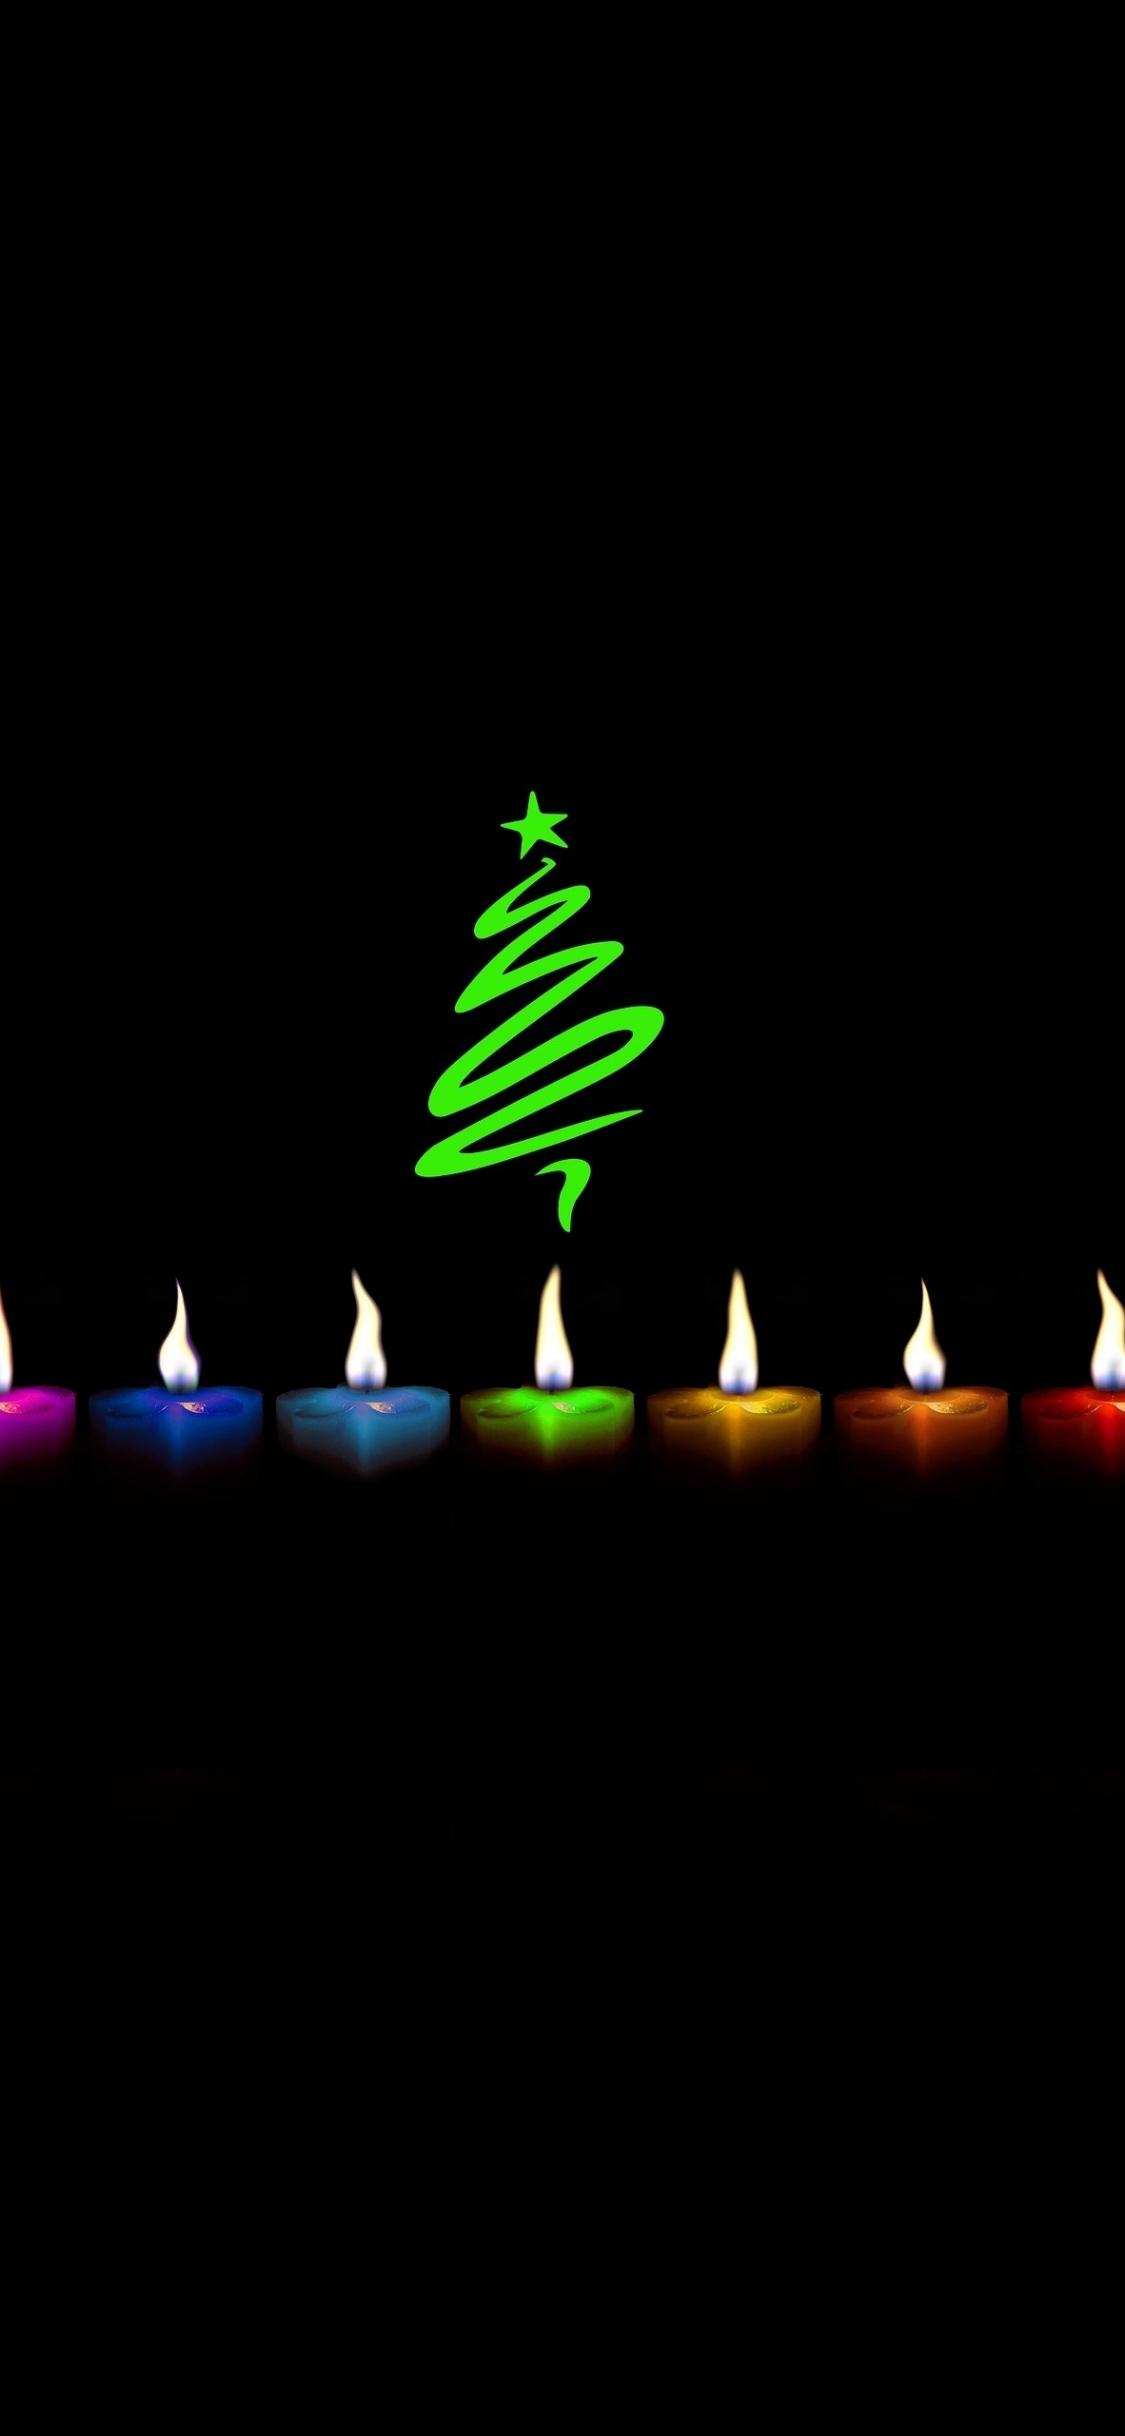 Download 1125x2436 Wallpaper Minimal Candles Christmas